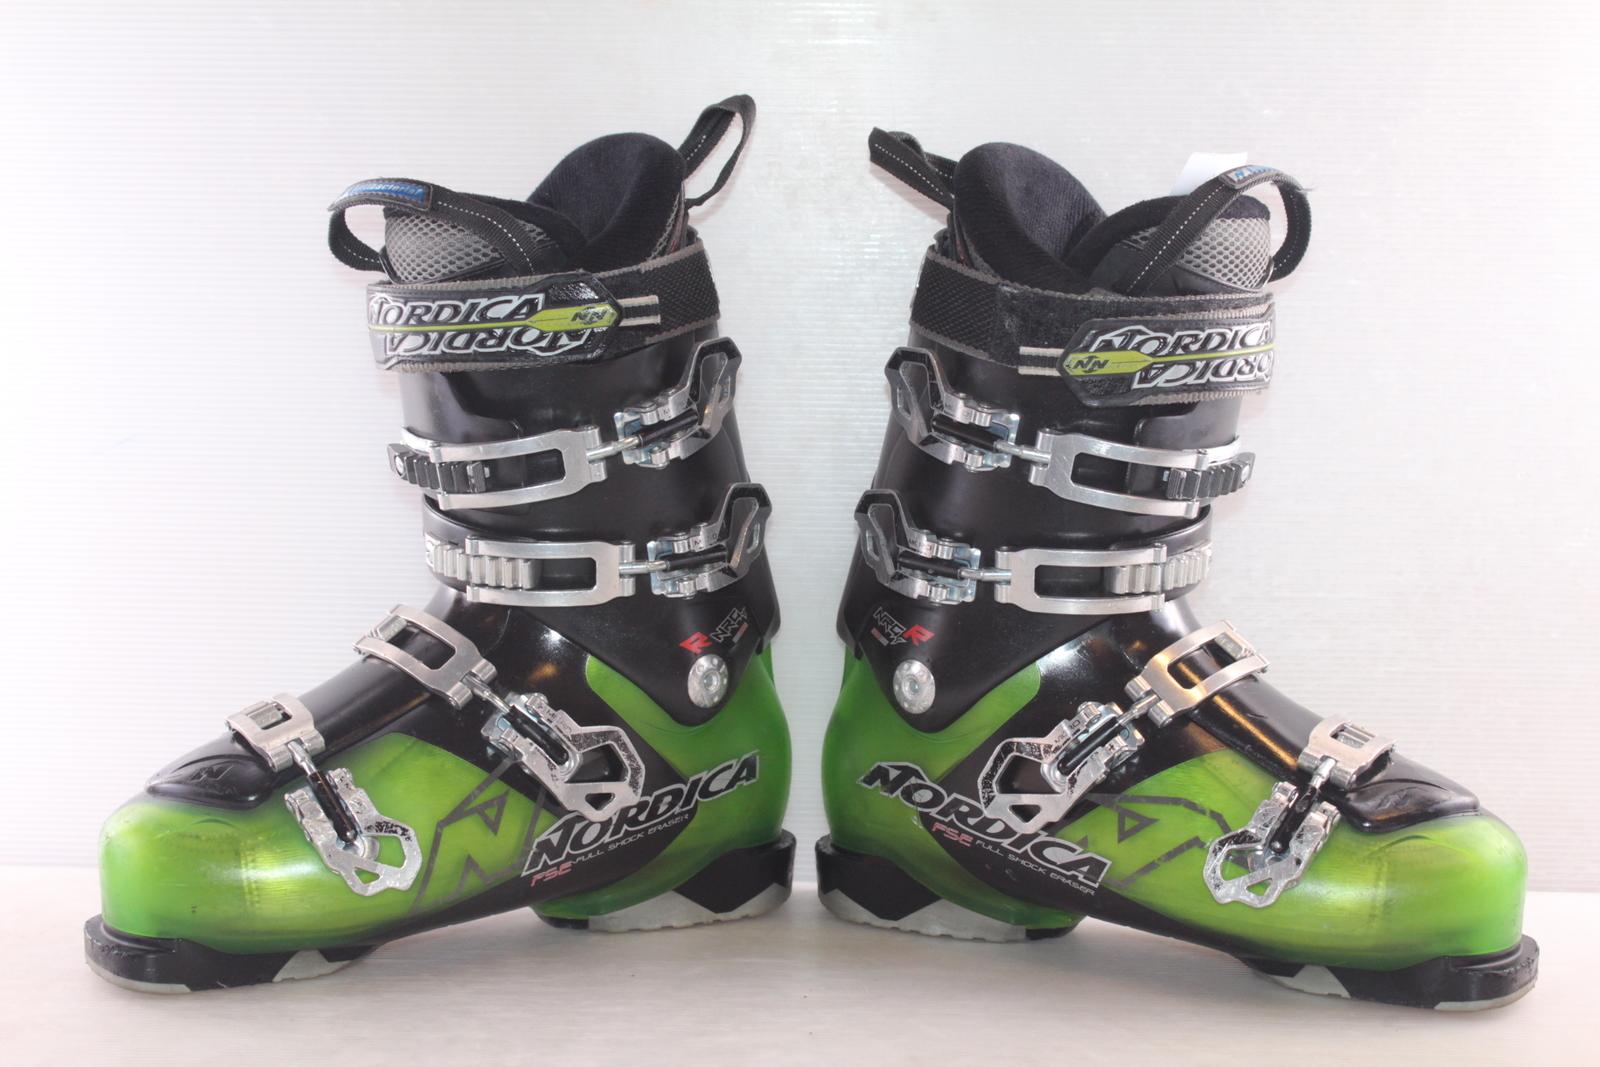 Lyžařské boty Nordica NRGY R100 vel. EU42.5 flexe 100